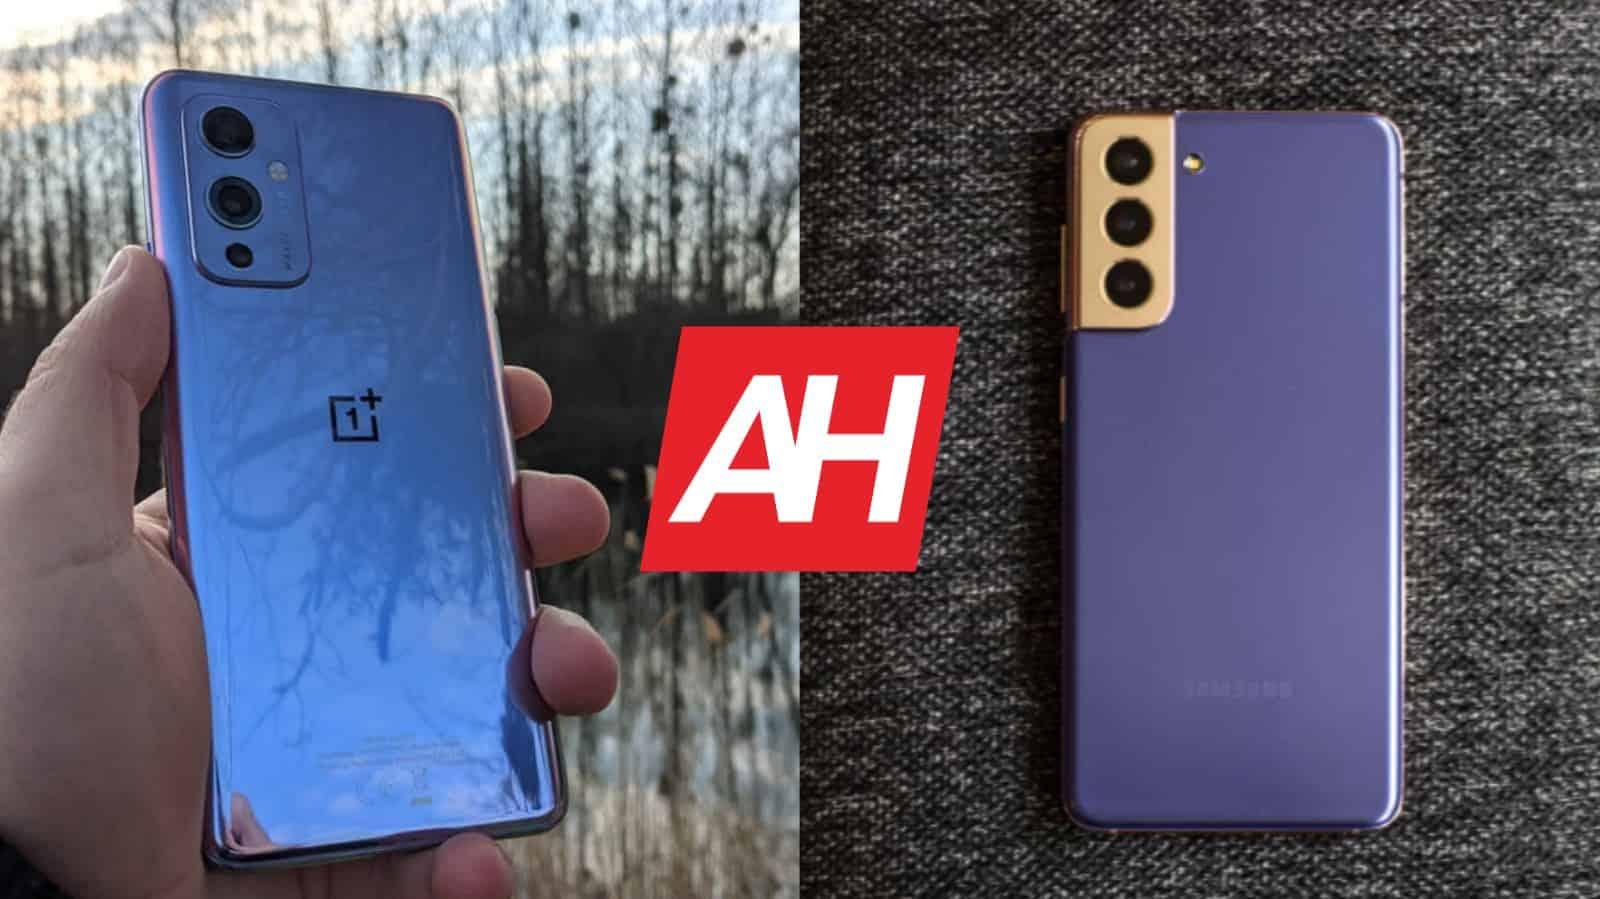 Phone Comparisons: OnePlus 9 vs Samsung Galaxy S21